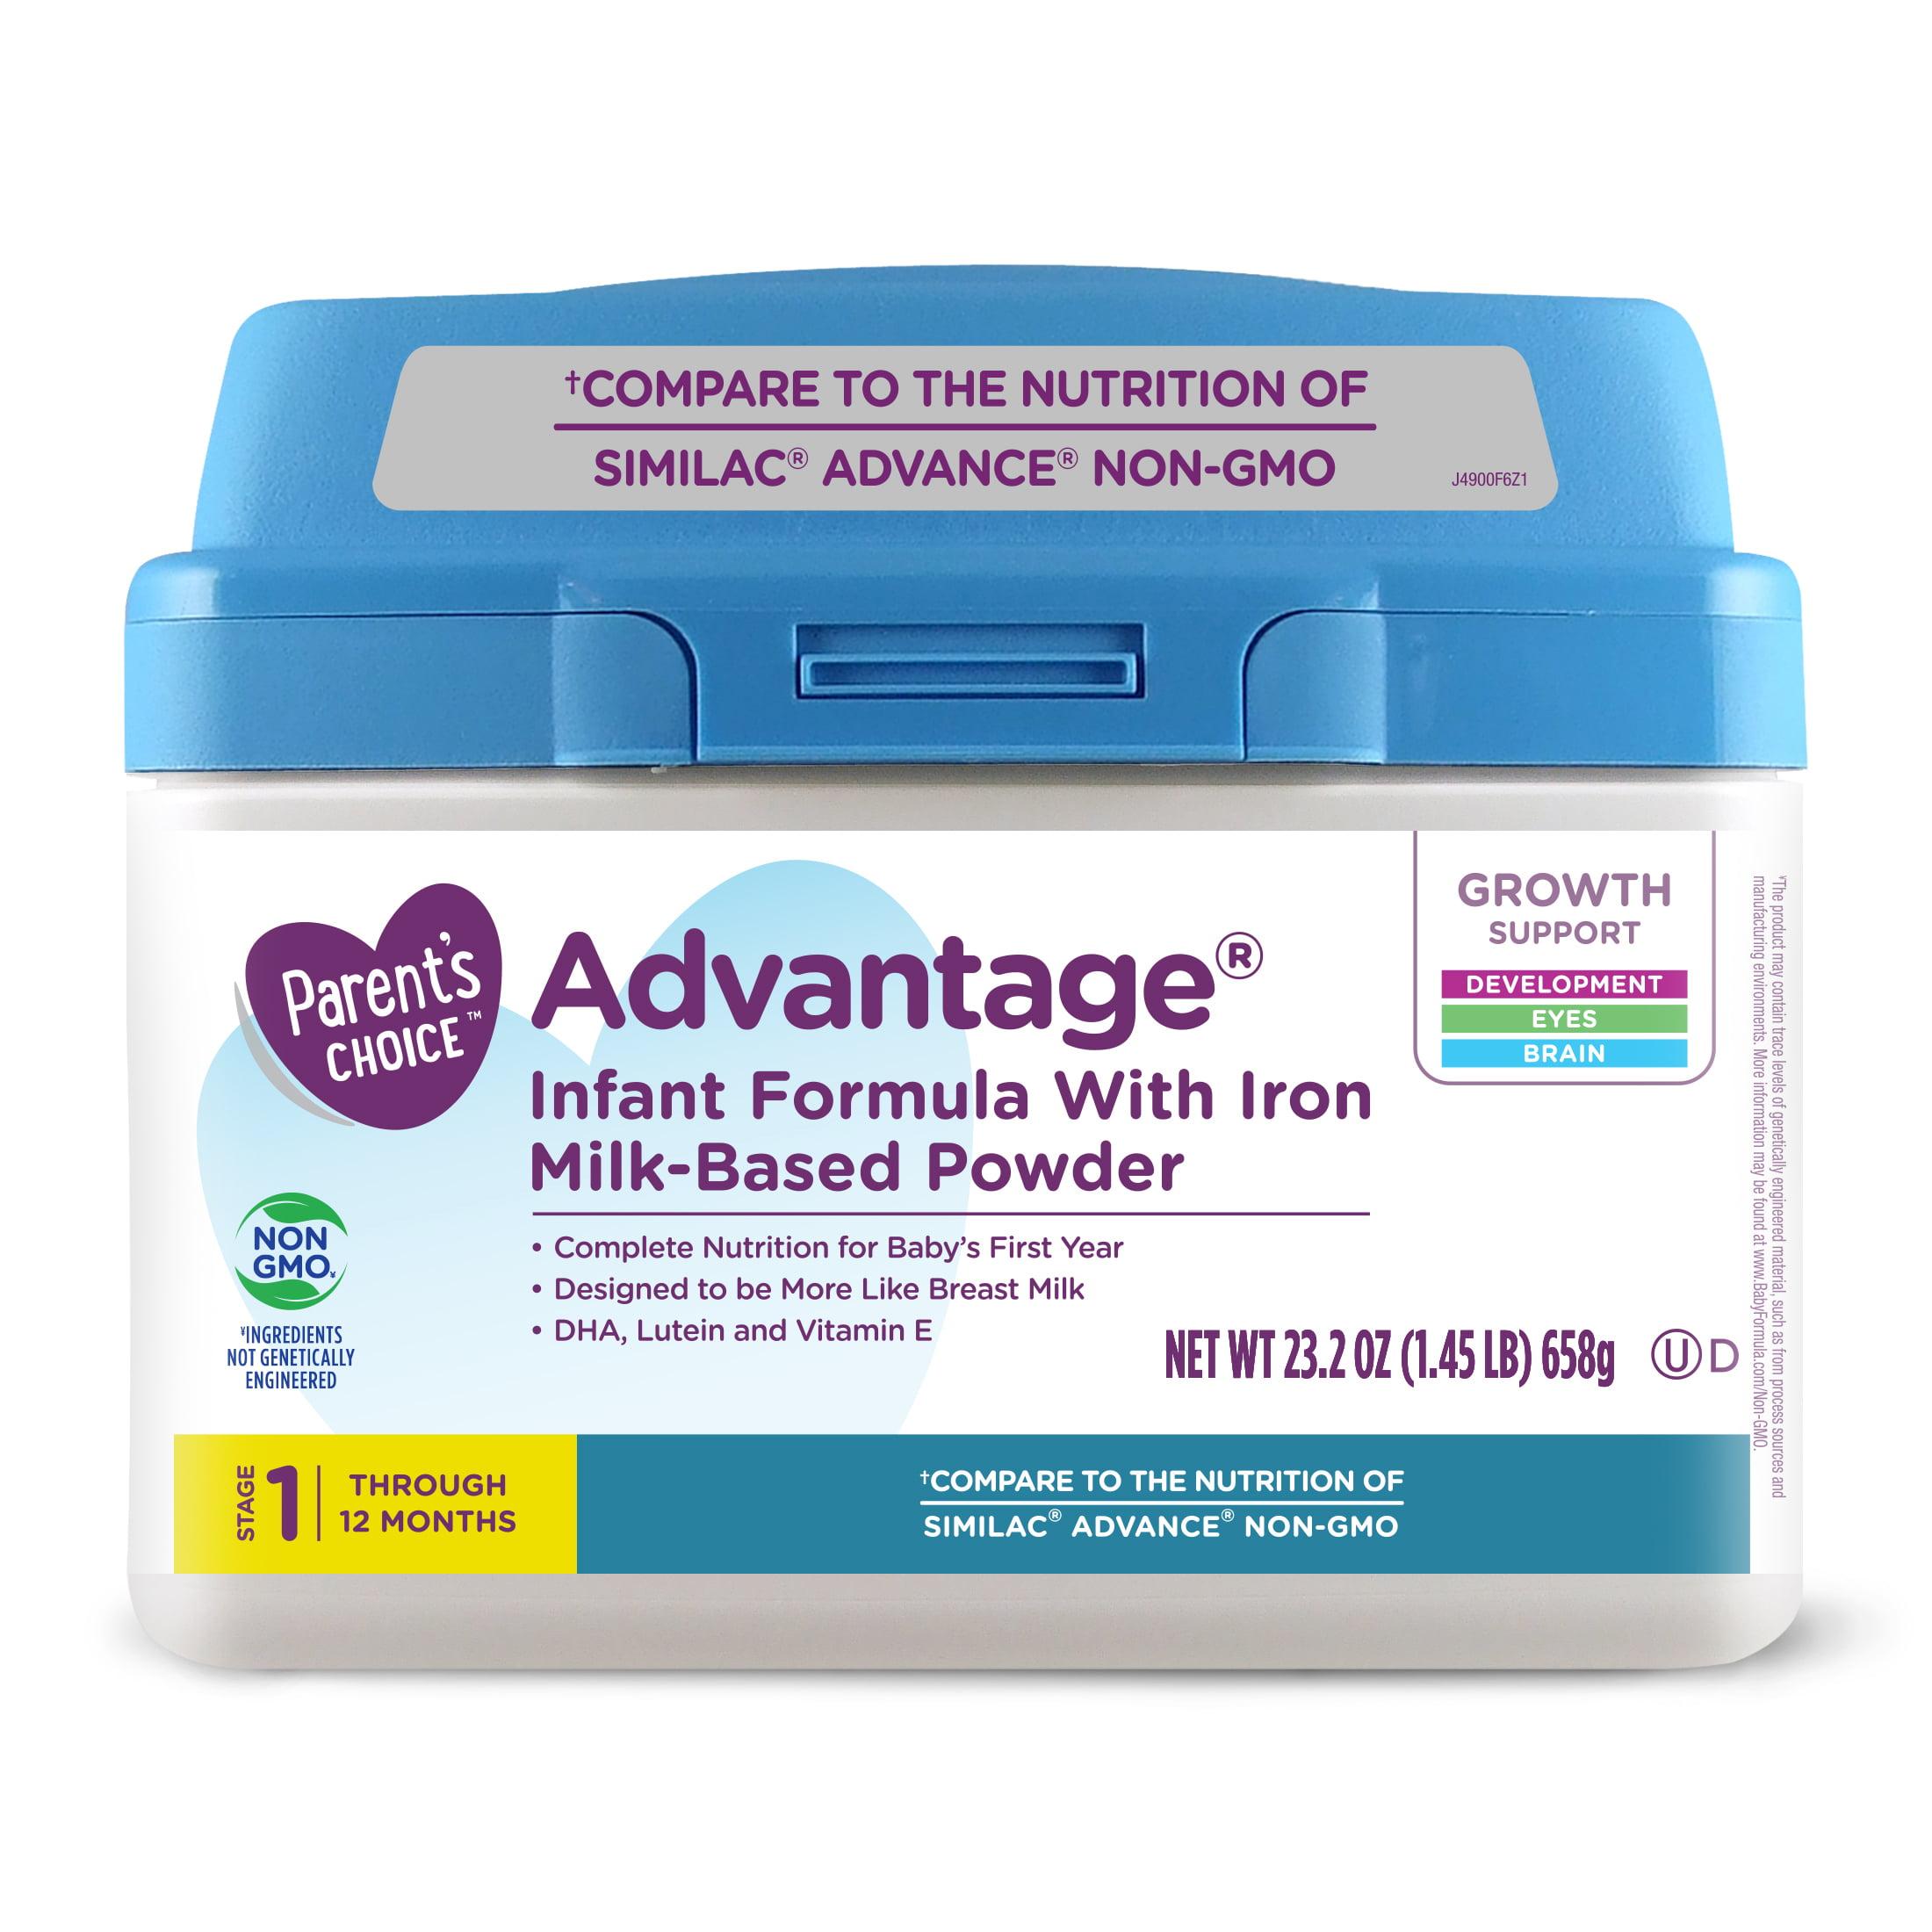 Parent's Choice Advantage Non-GMO Infant Formula with Iron, 23.2 oz